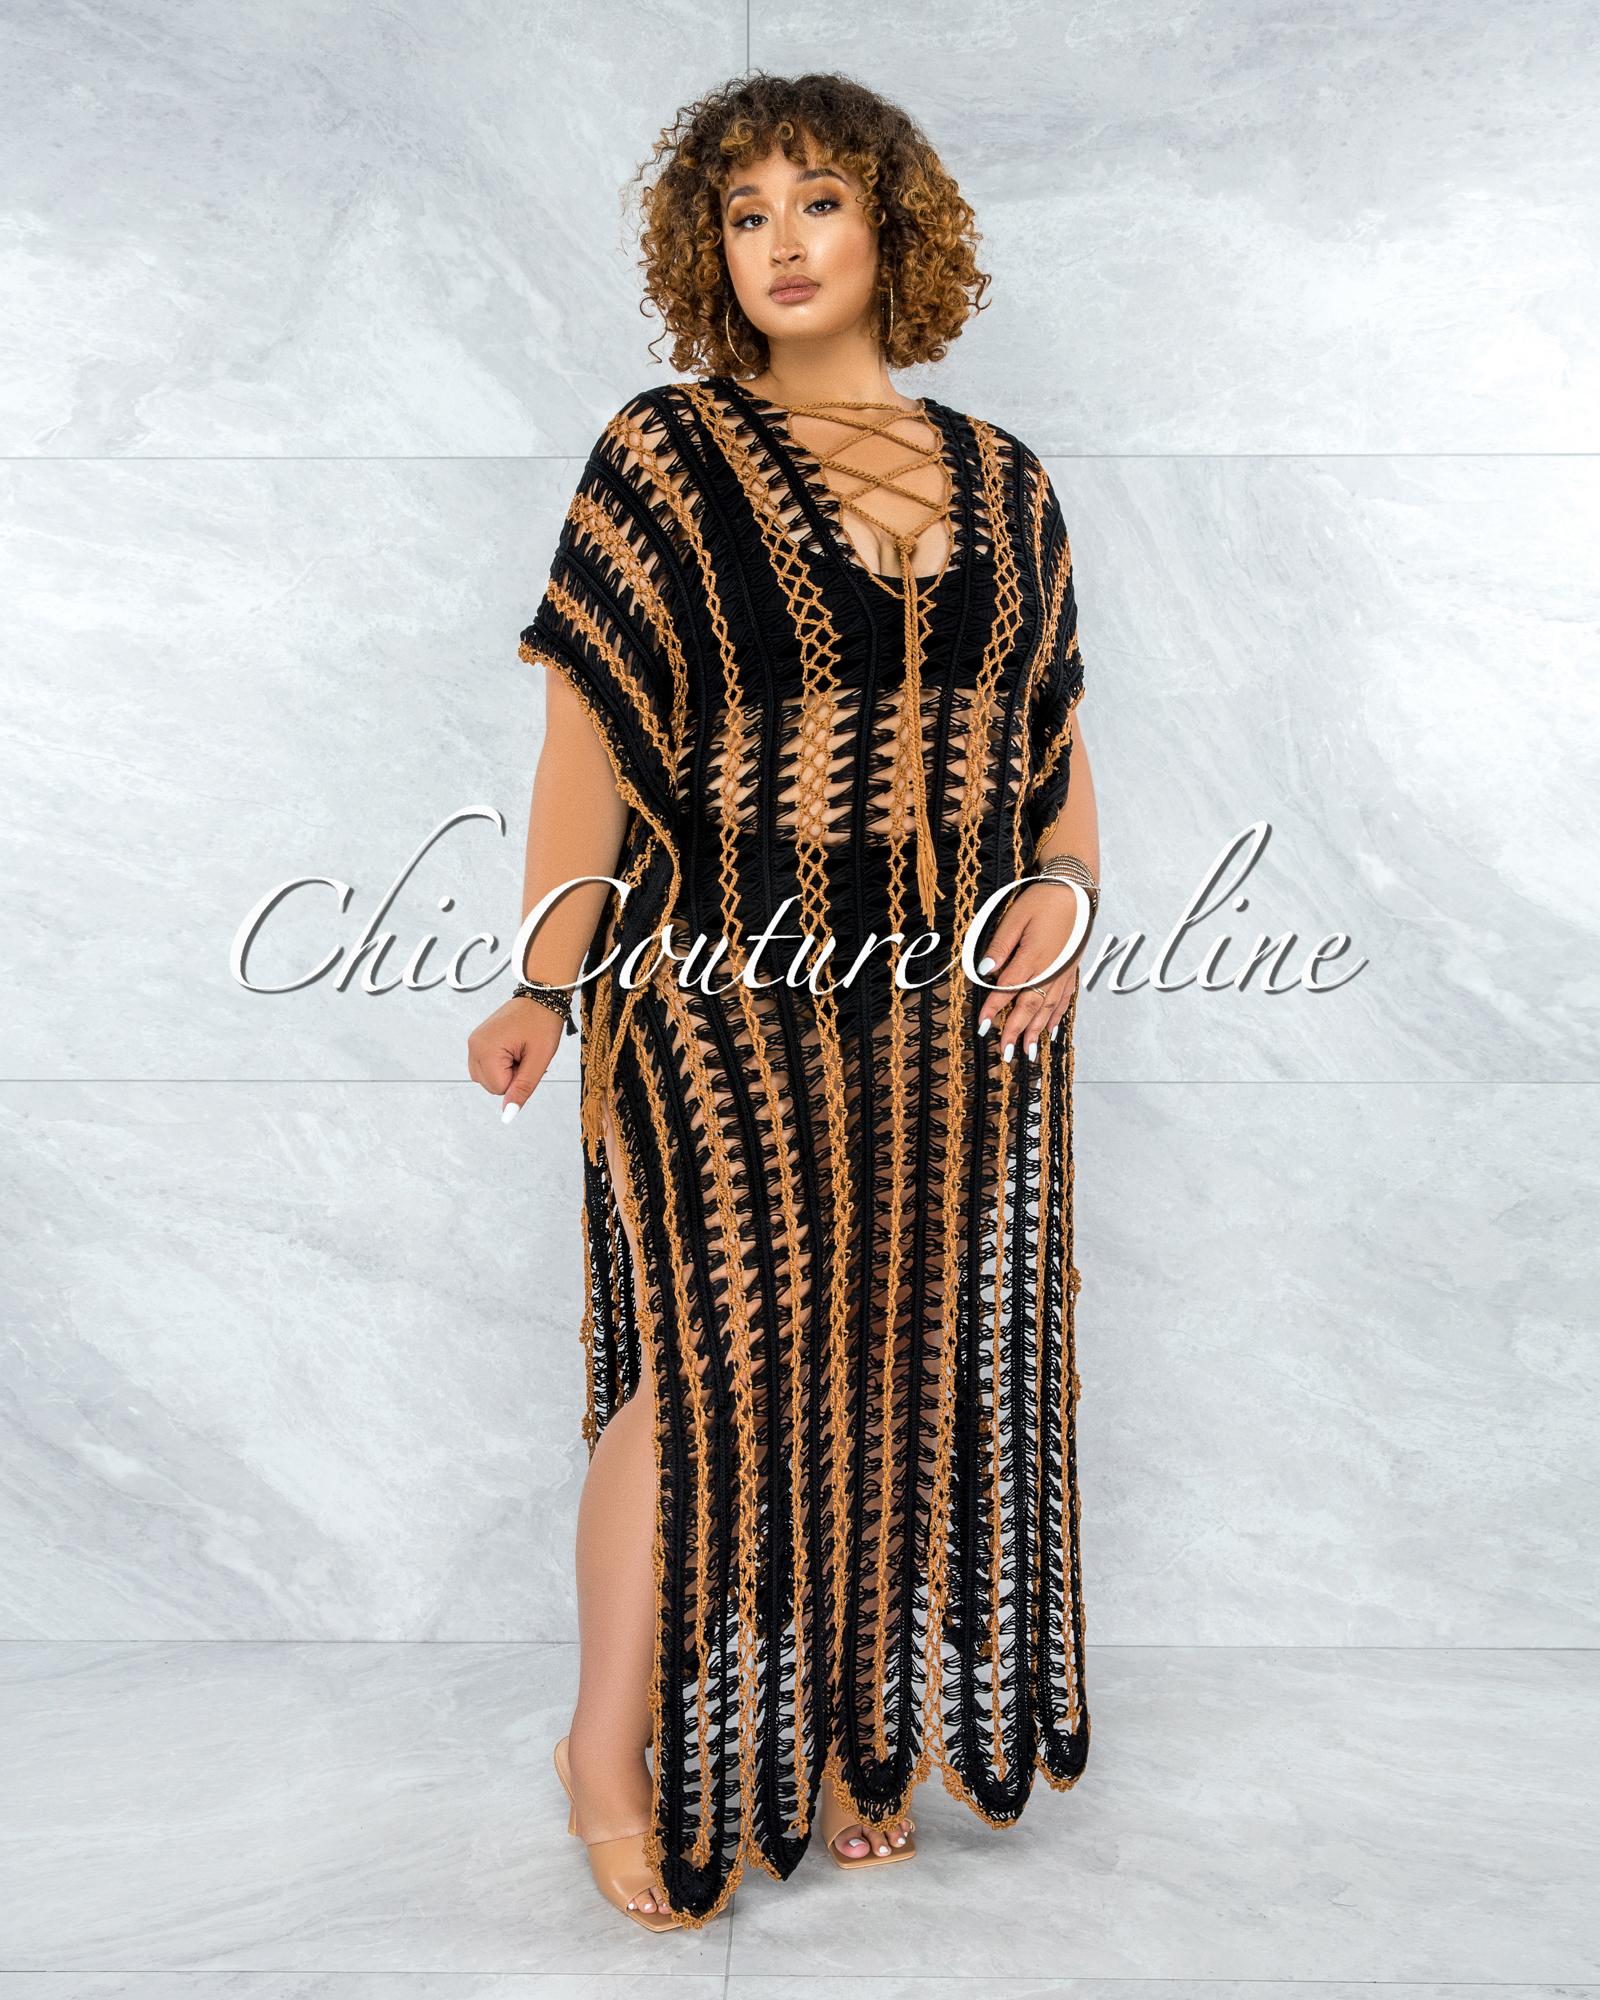 Cabo Black Mocha Crochet Cover-Up Maxi Dress